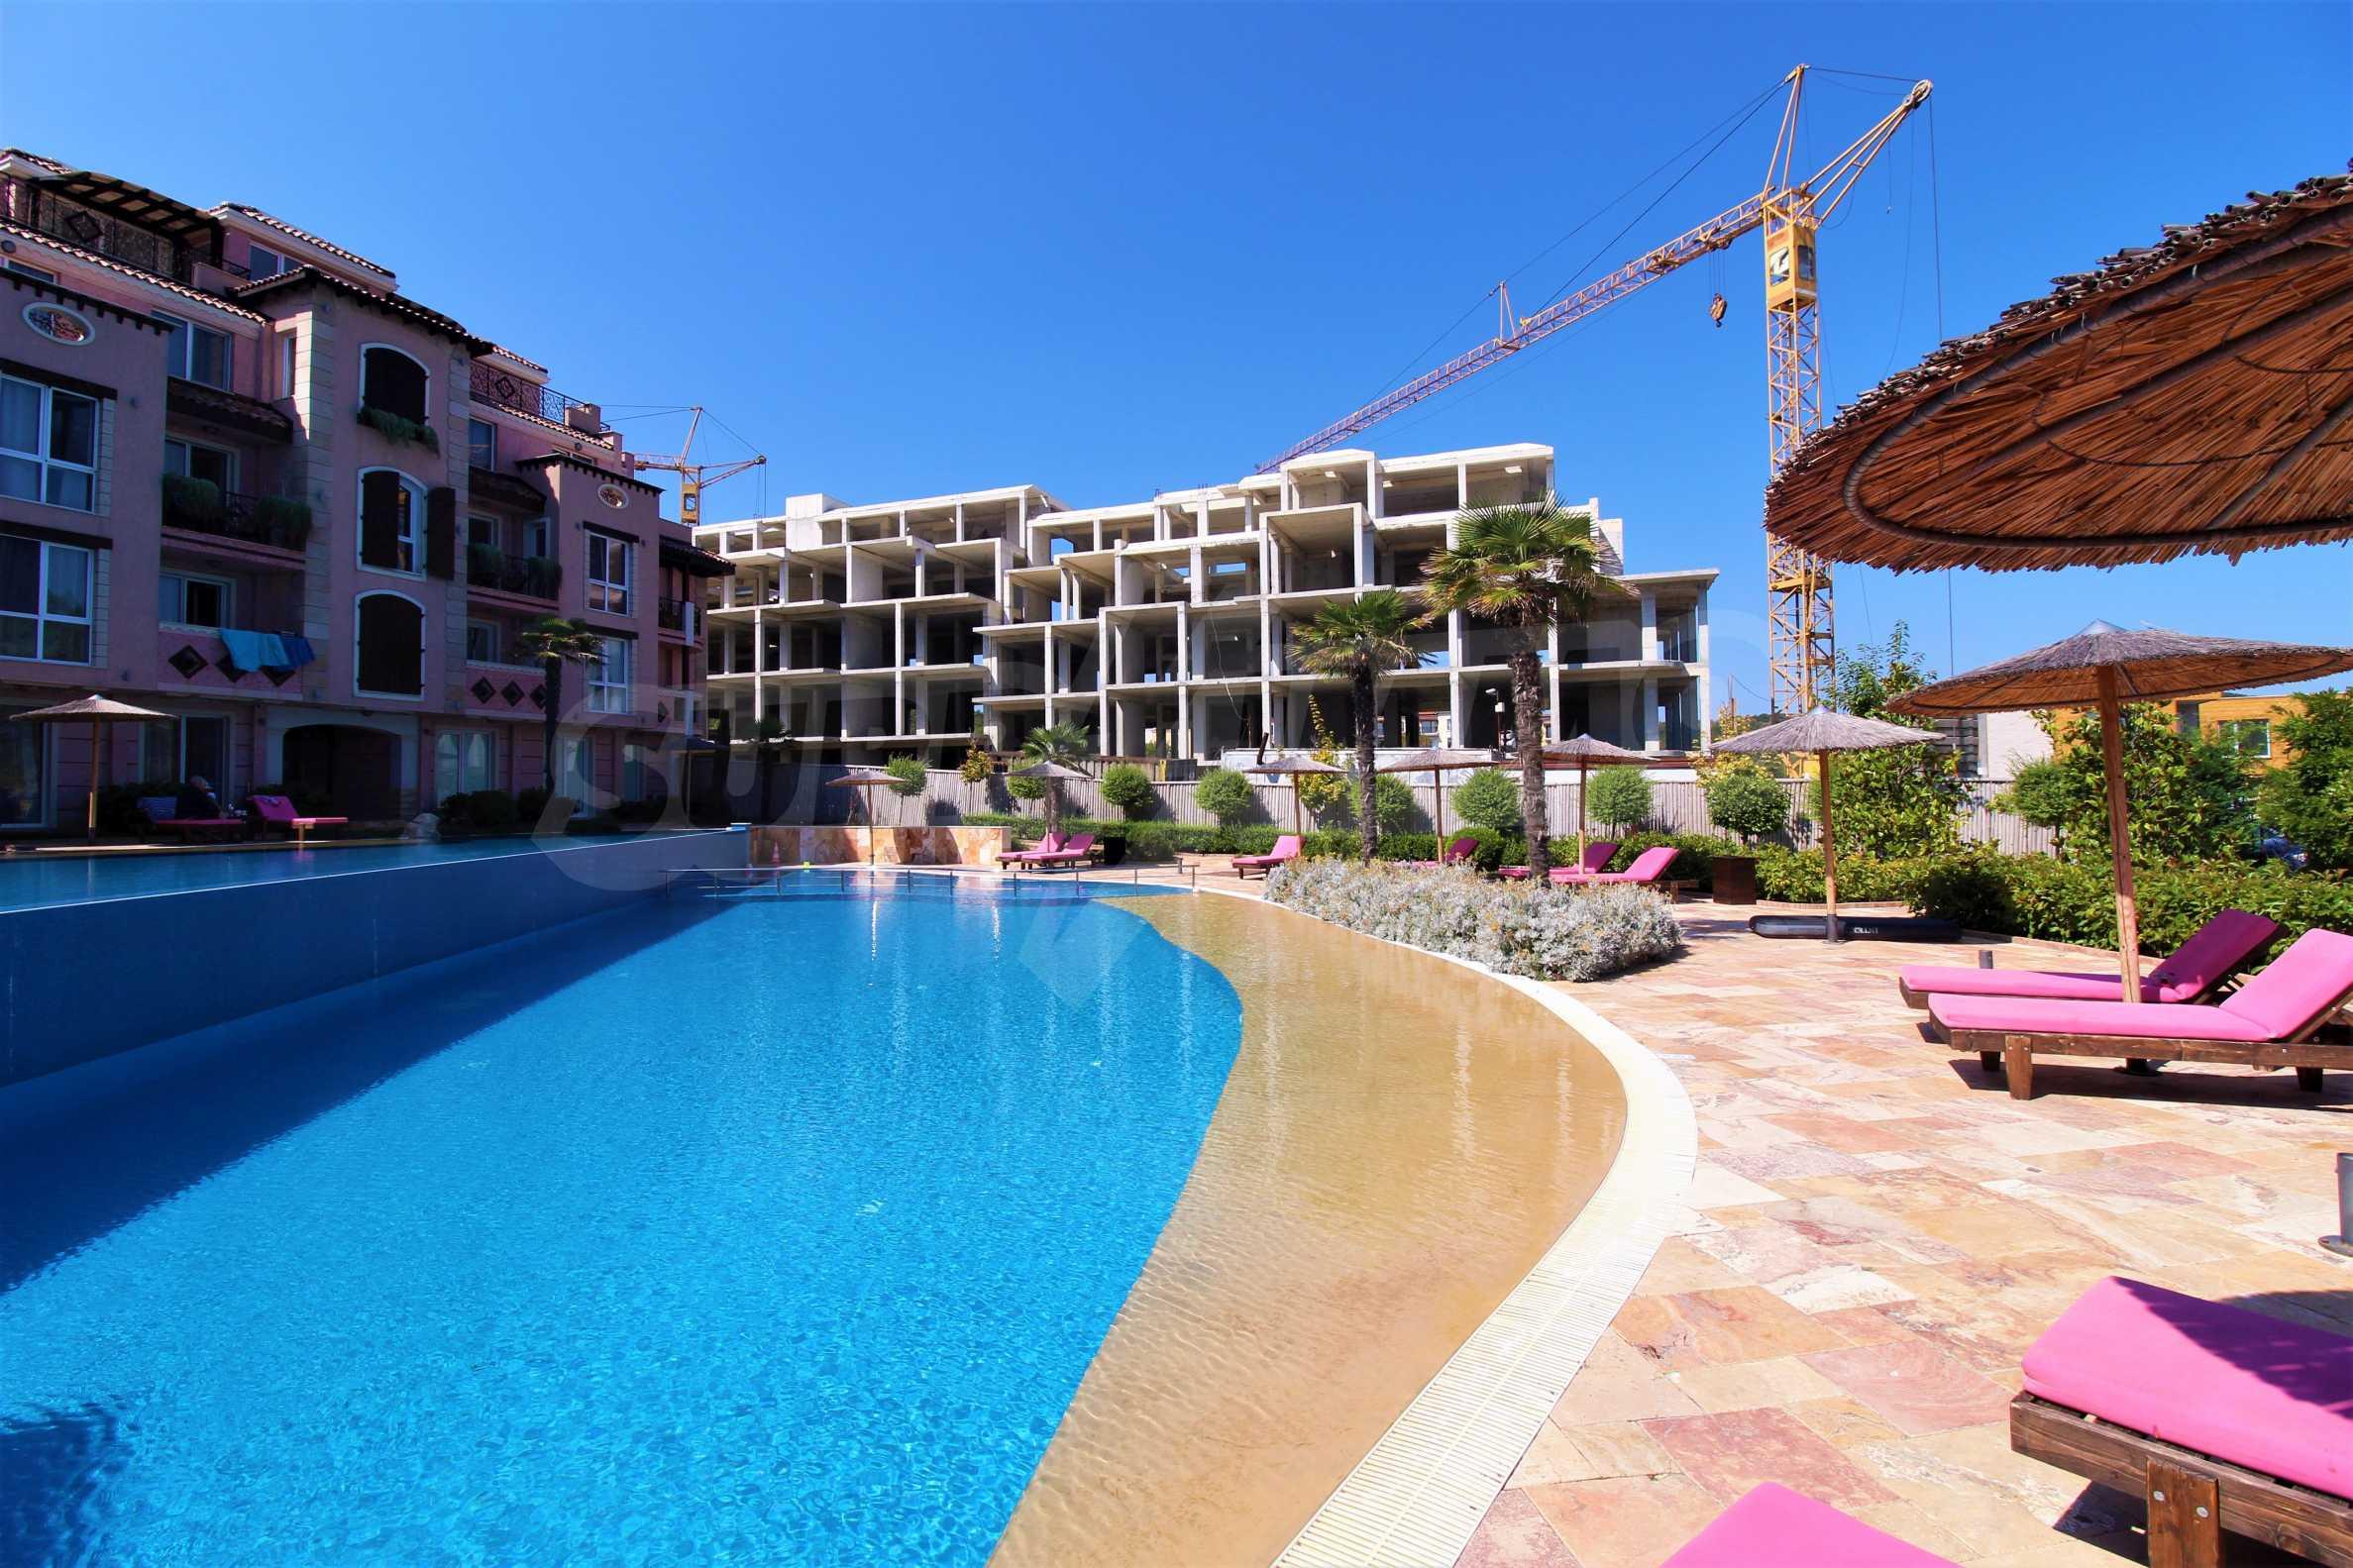 New 1-bedroom apartment in a coastal complex by the Kavatsite Beach (Sozopol) 15